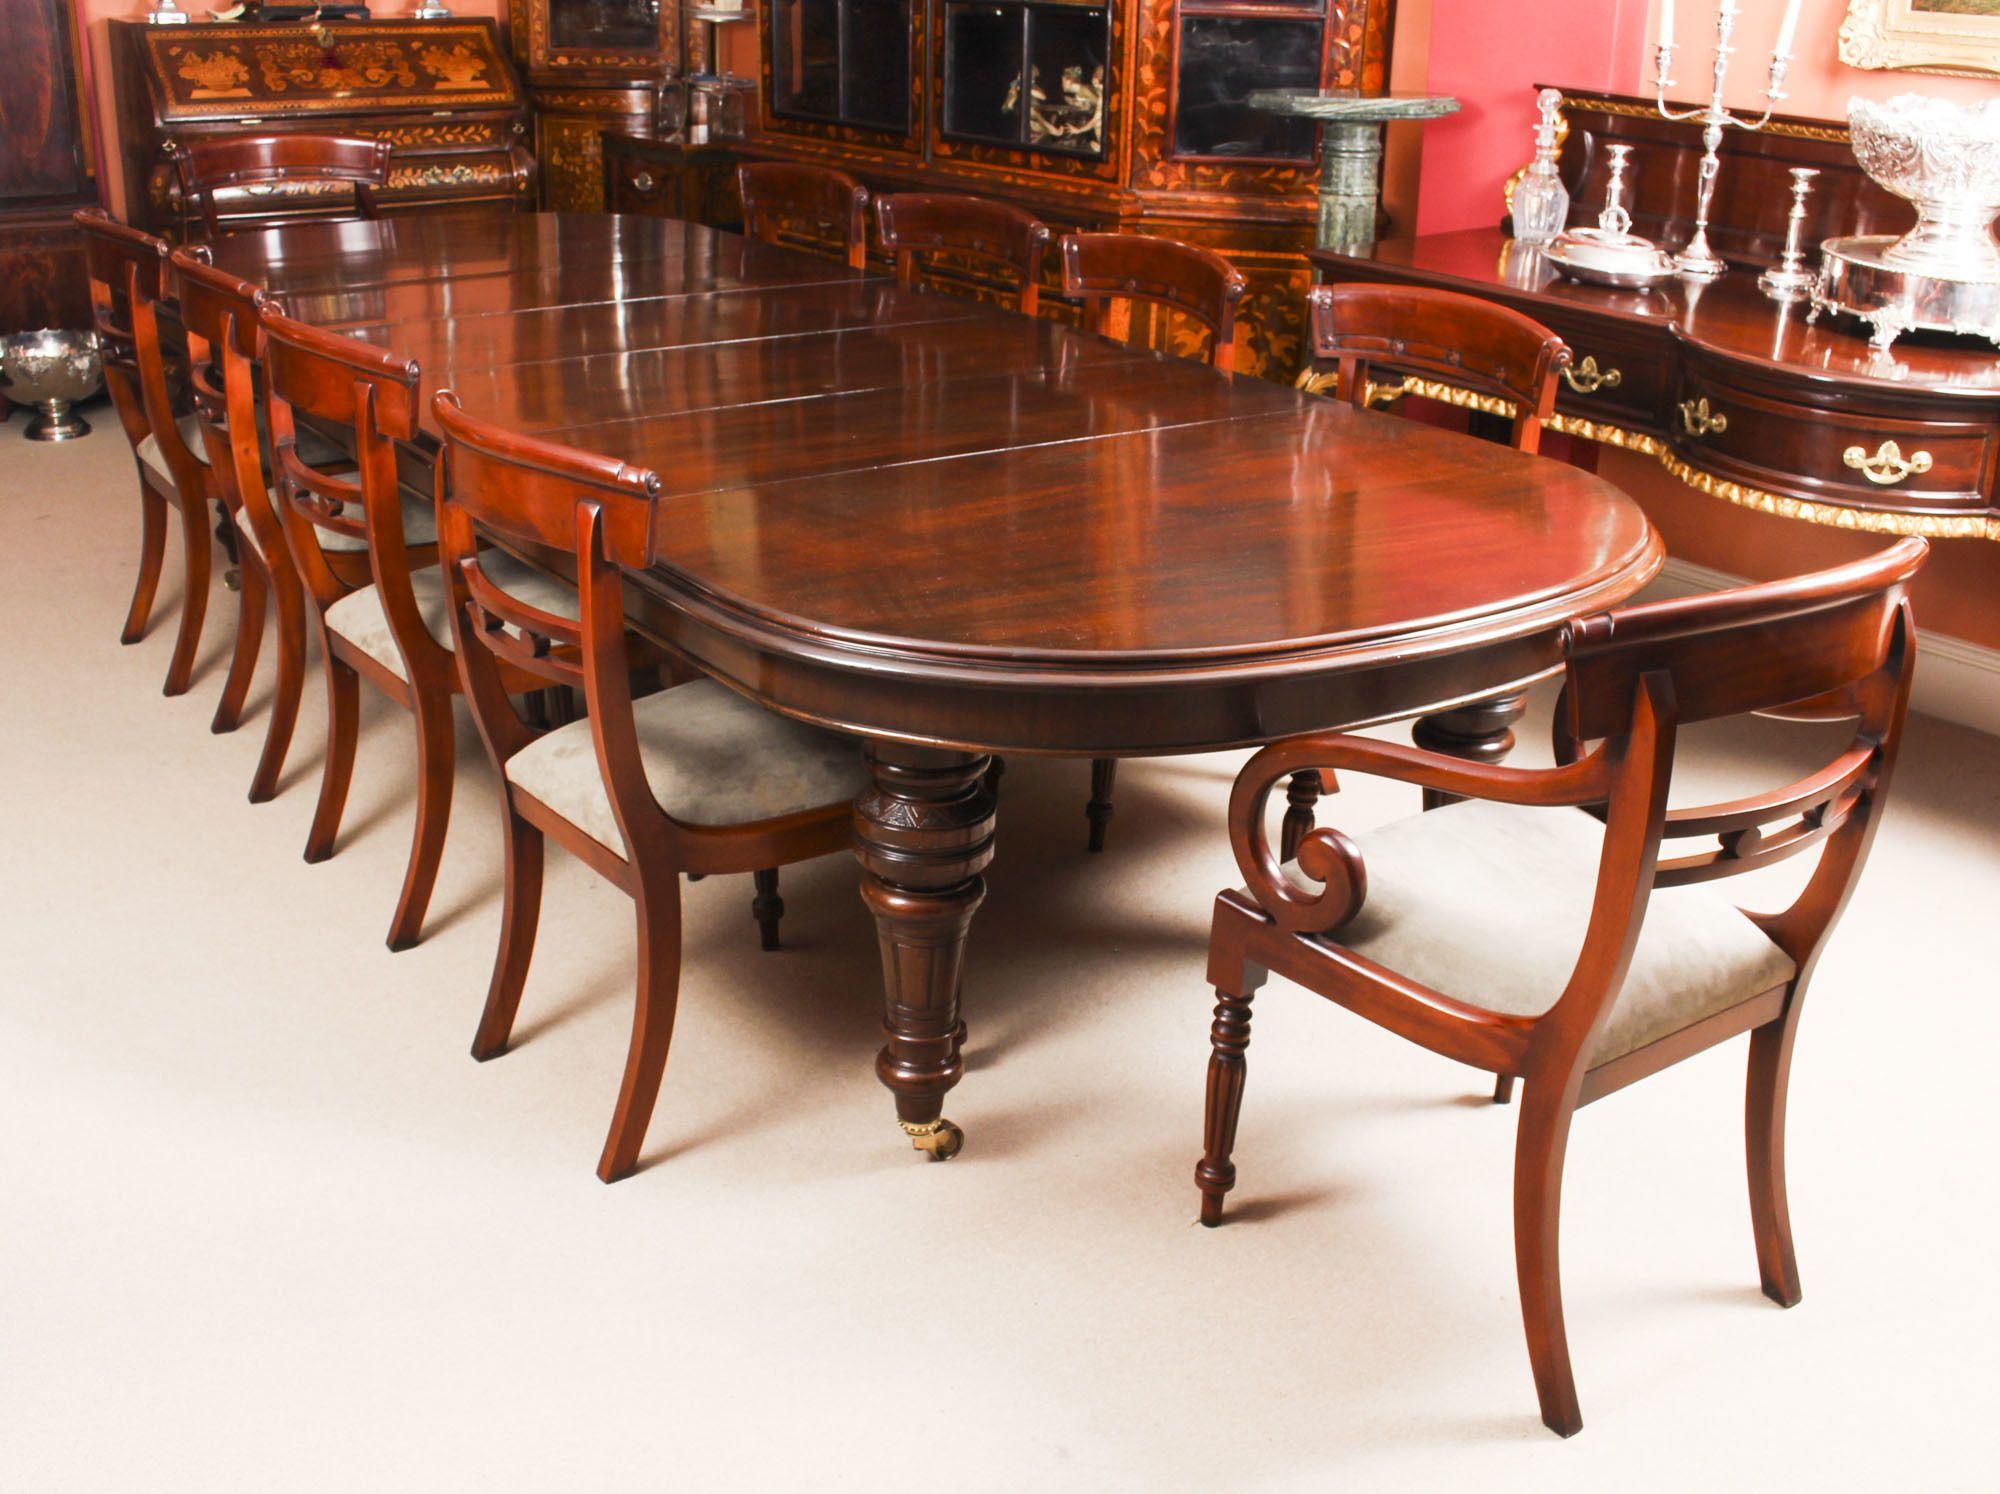 Antique 12ft Victorian D End Mahogany Dining Table C1870 10 Chairs Mahogany Dining Table Dining Table Victorian Dining Tables